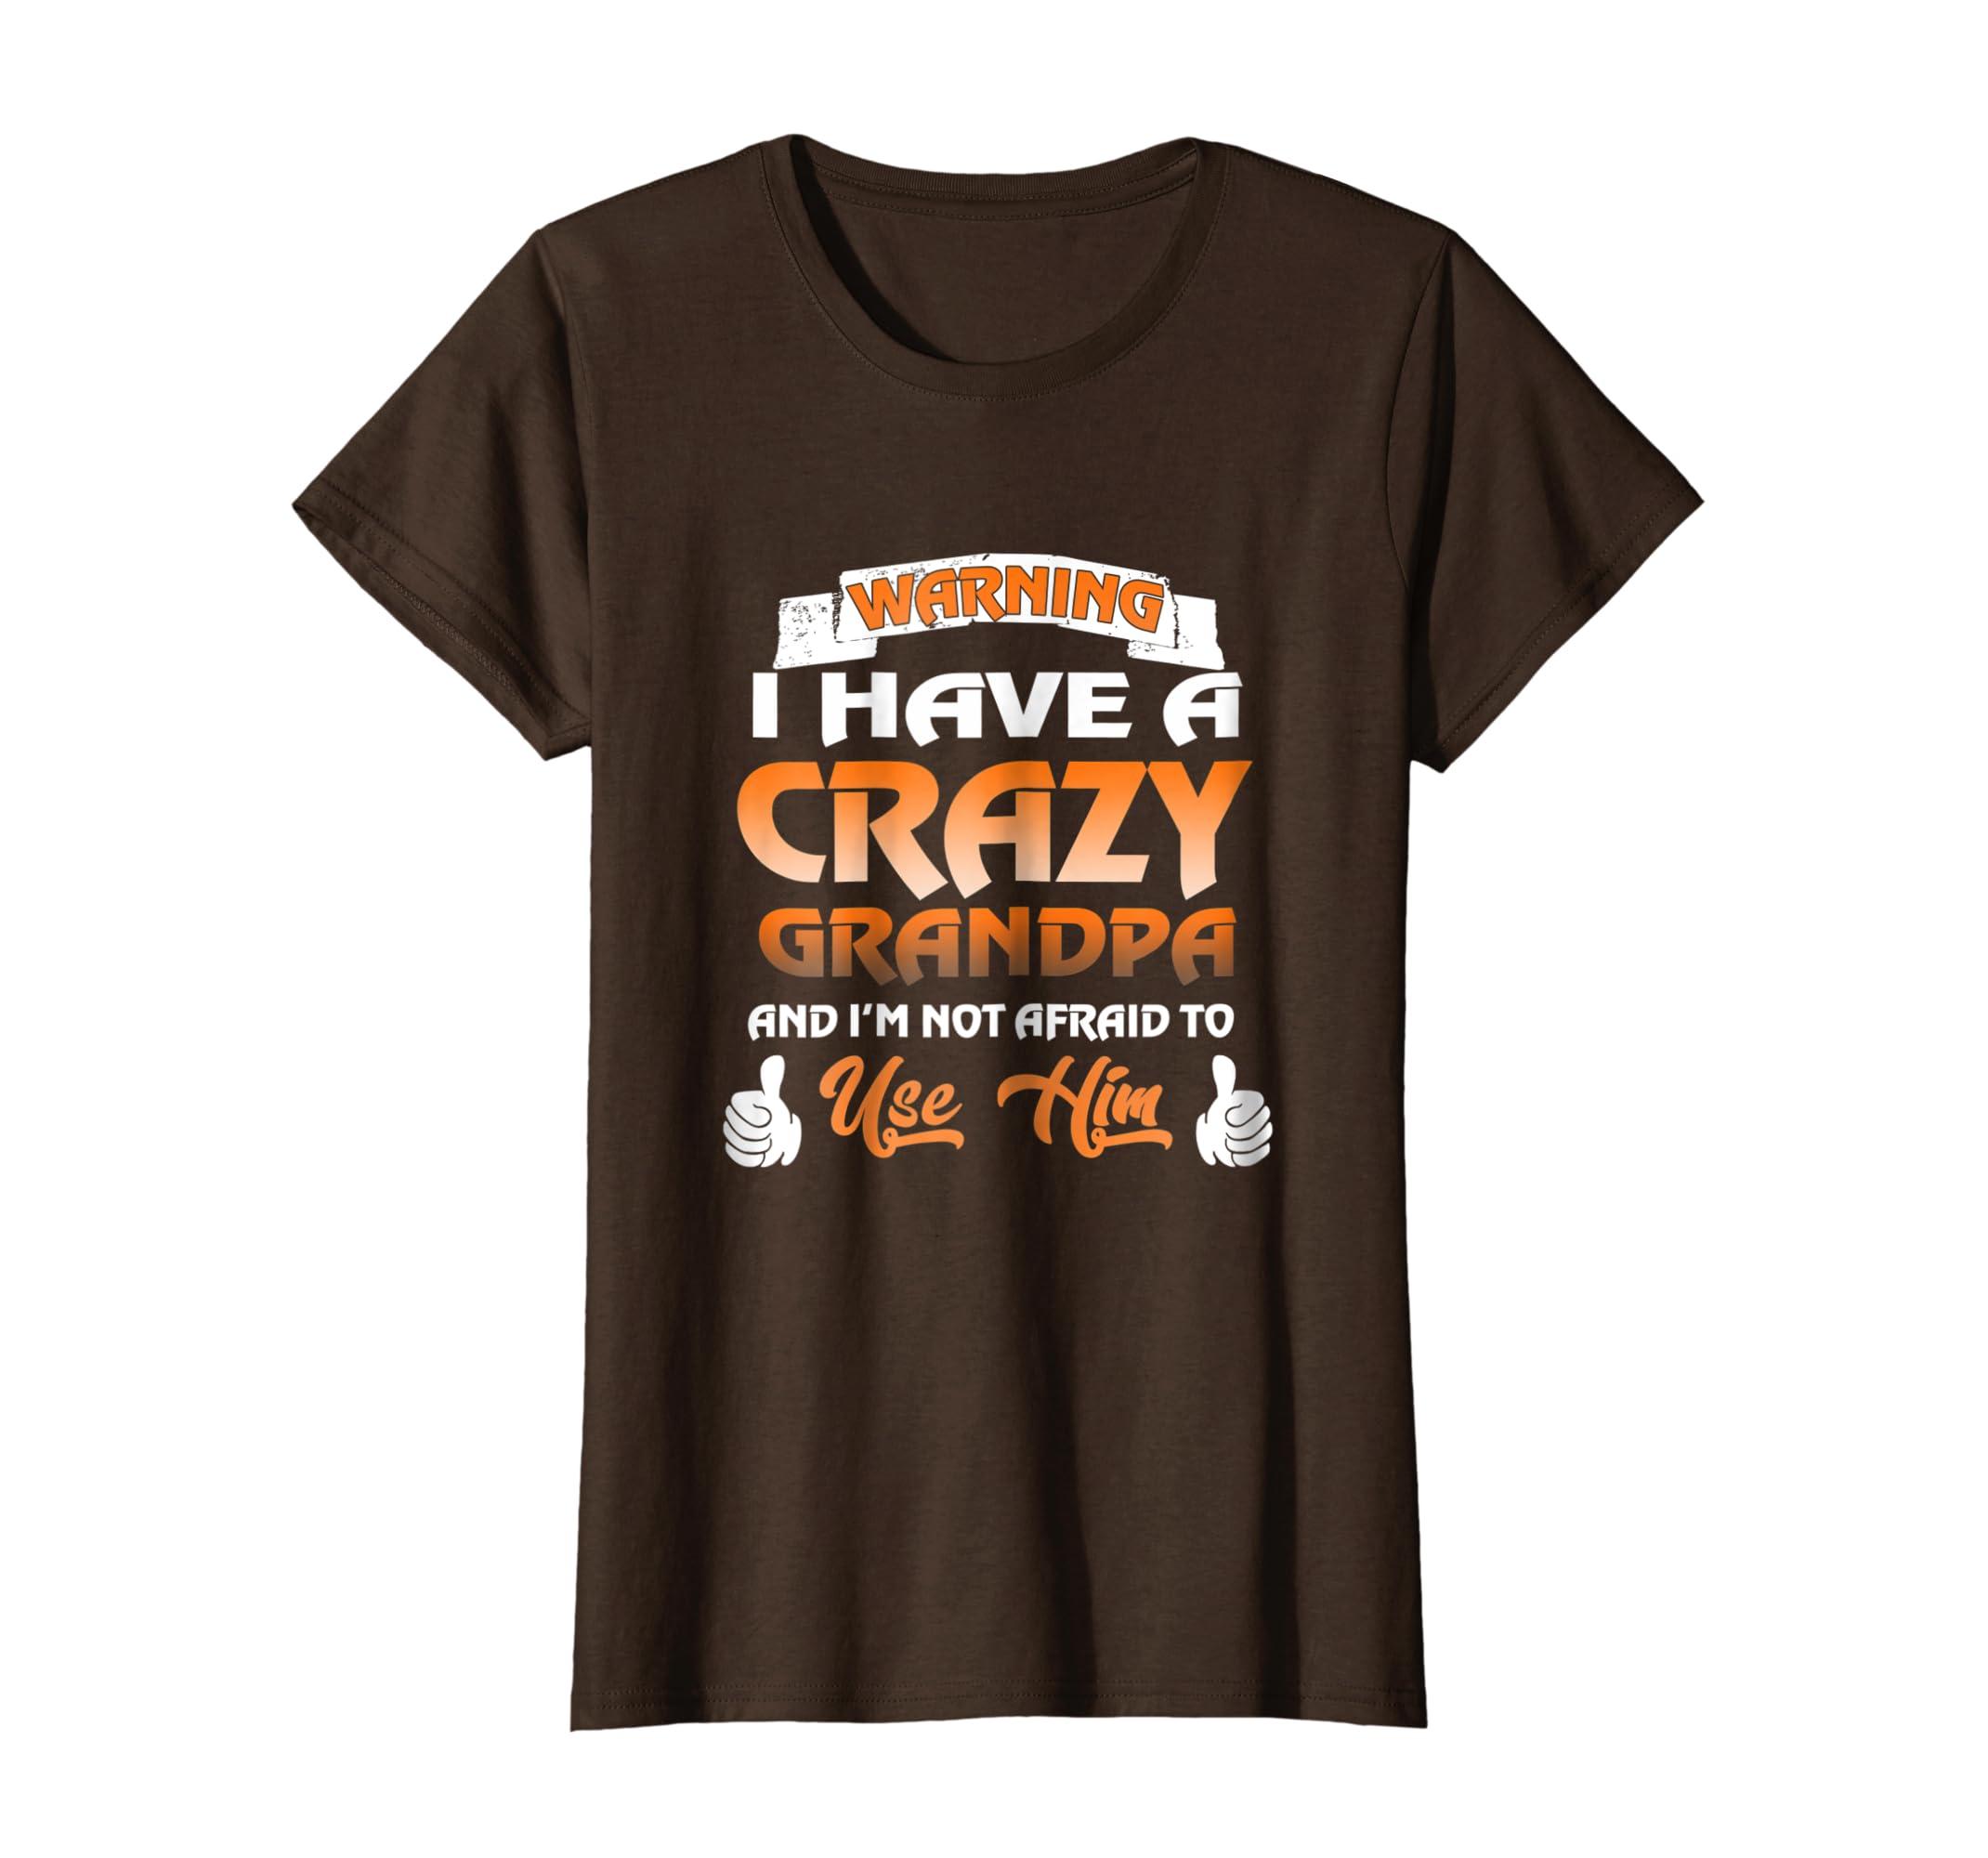 db03f493 Amazon.com: Warning I Have A Crazy Grandpa T-shirt: Clothing